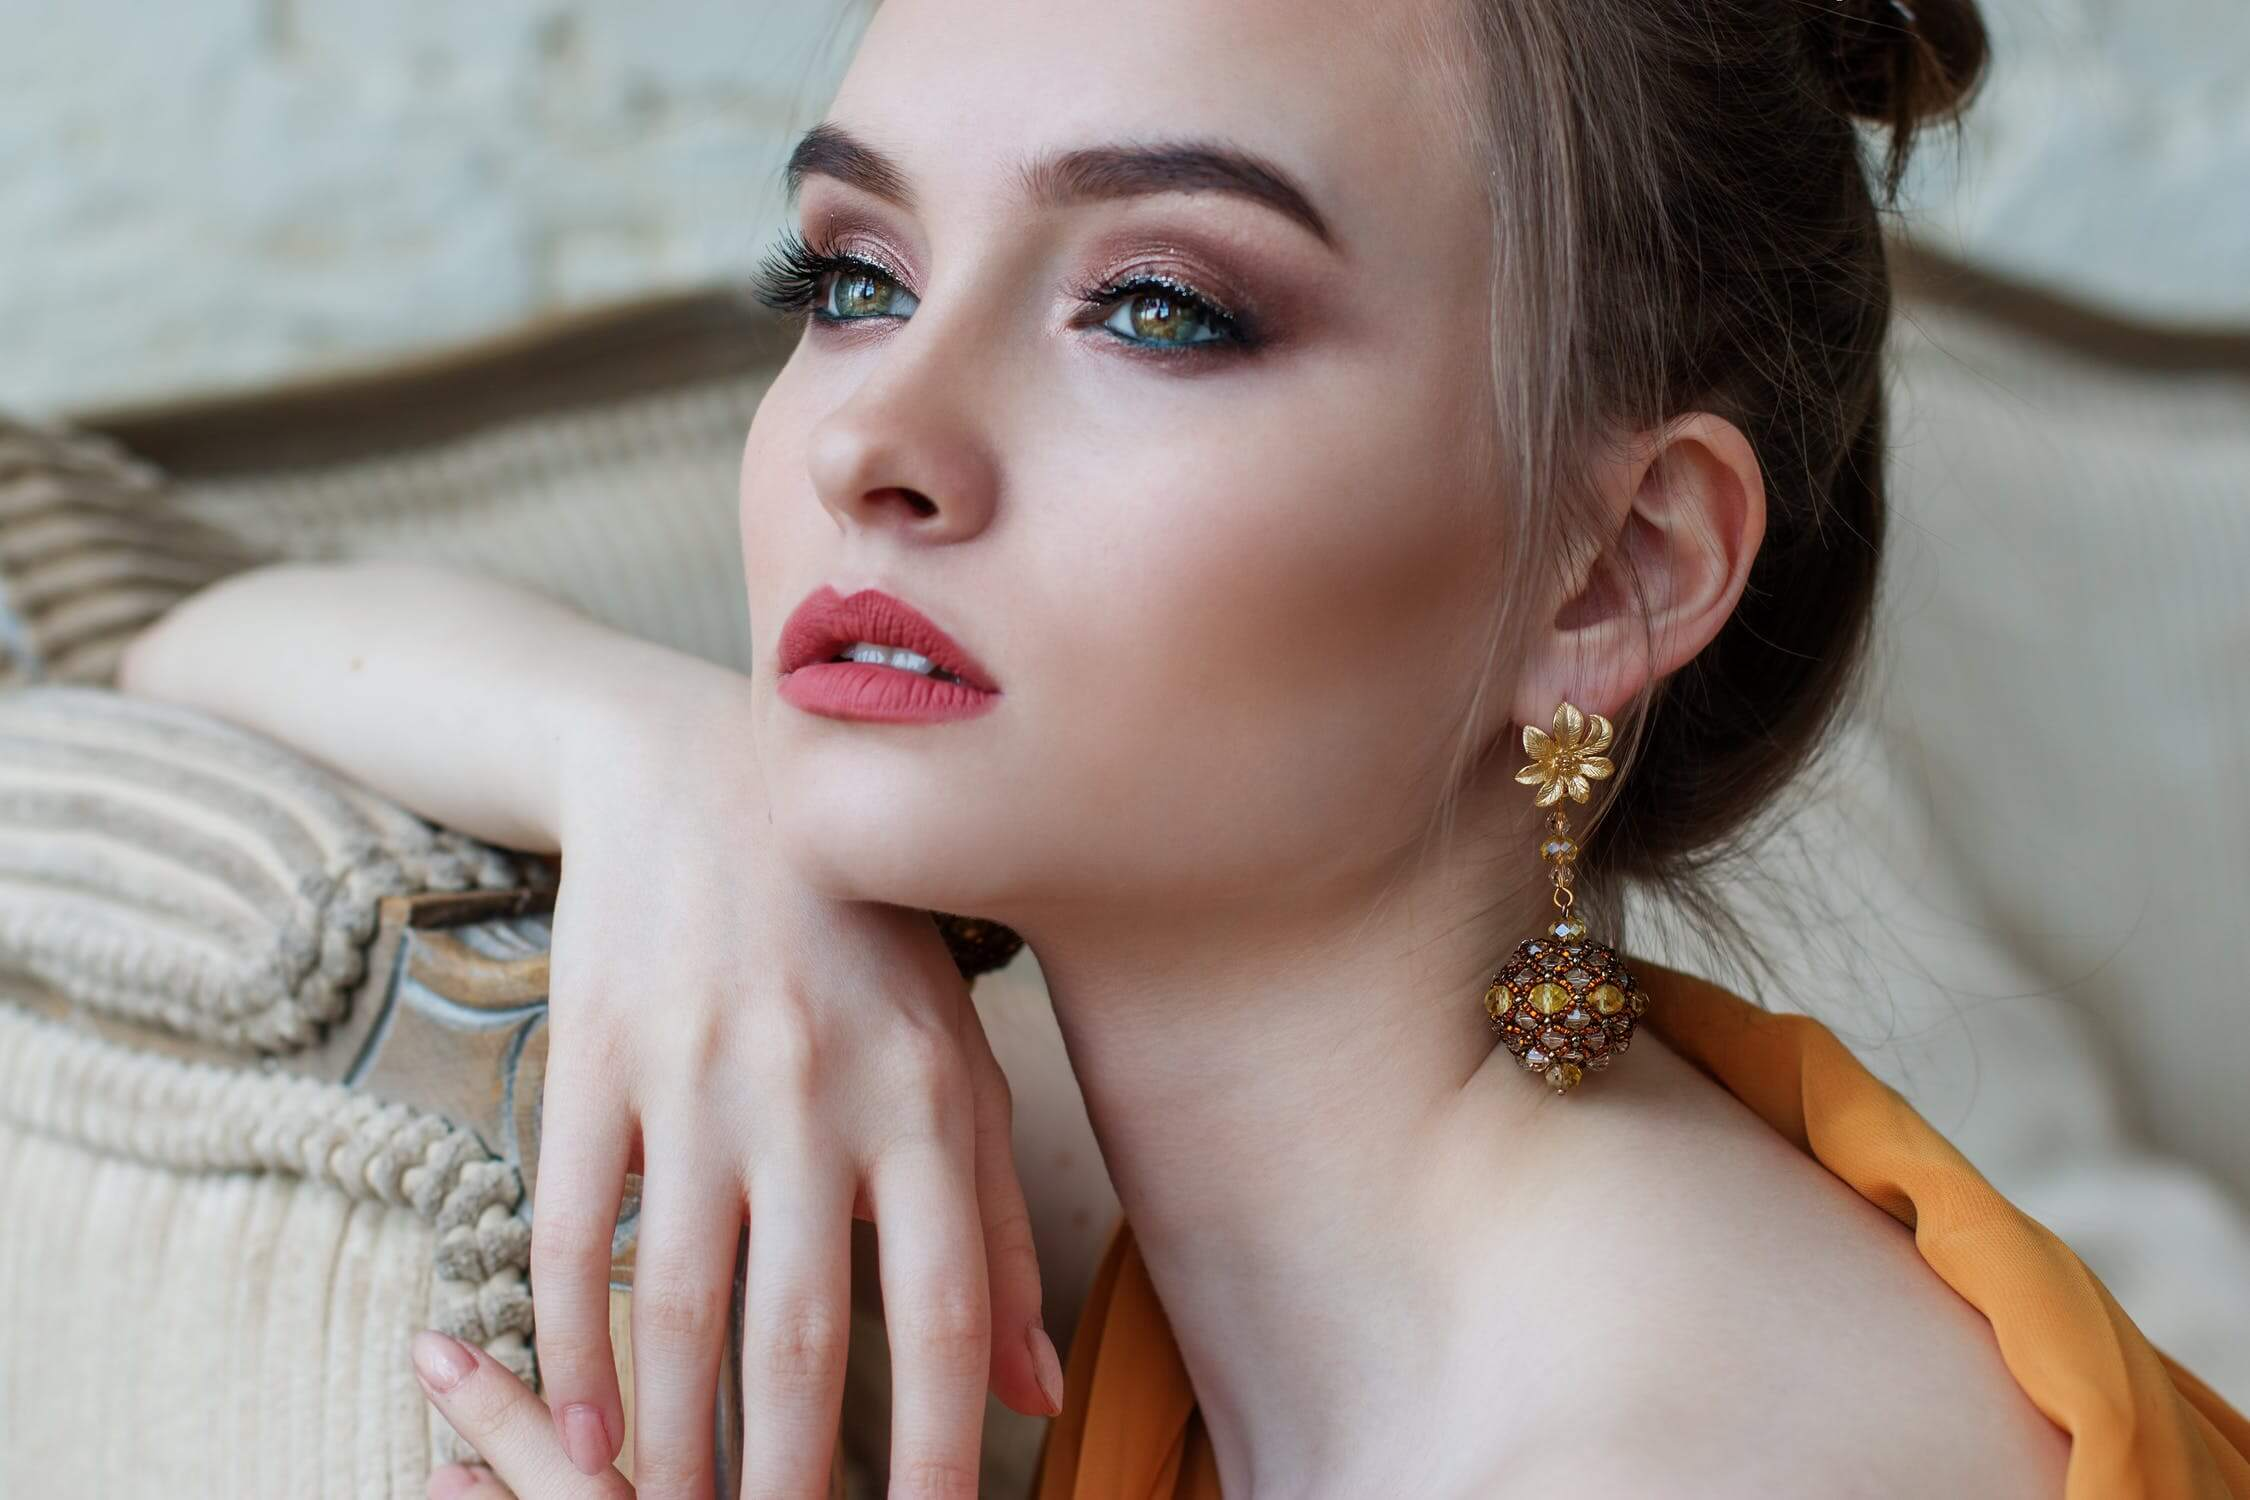 Cosmetics - Get Health Access